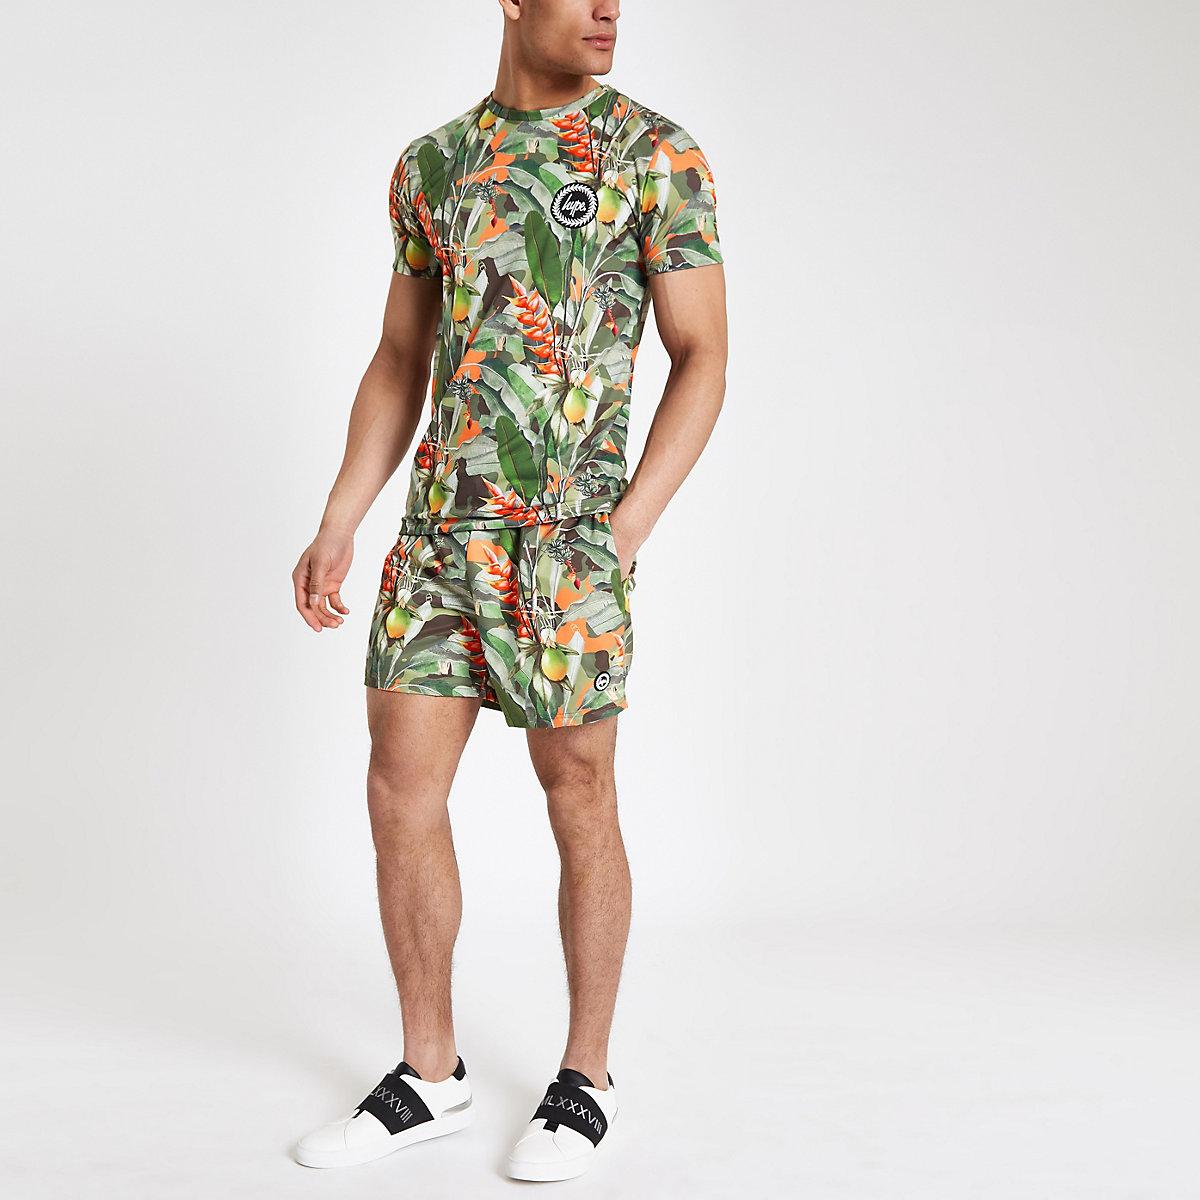 Hype green tropical print T-shirt